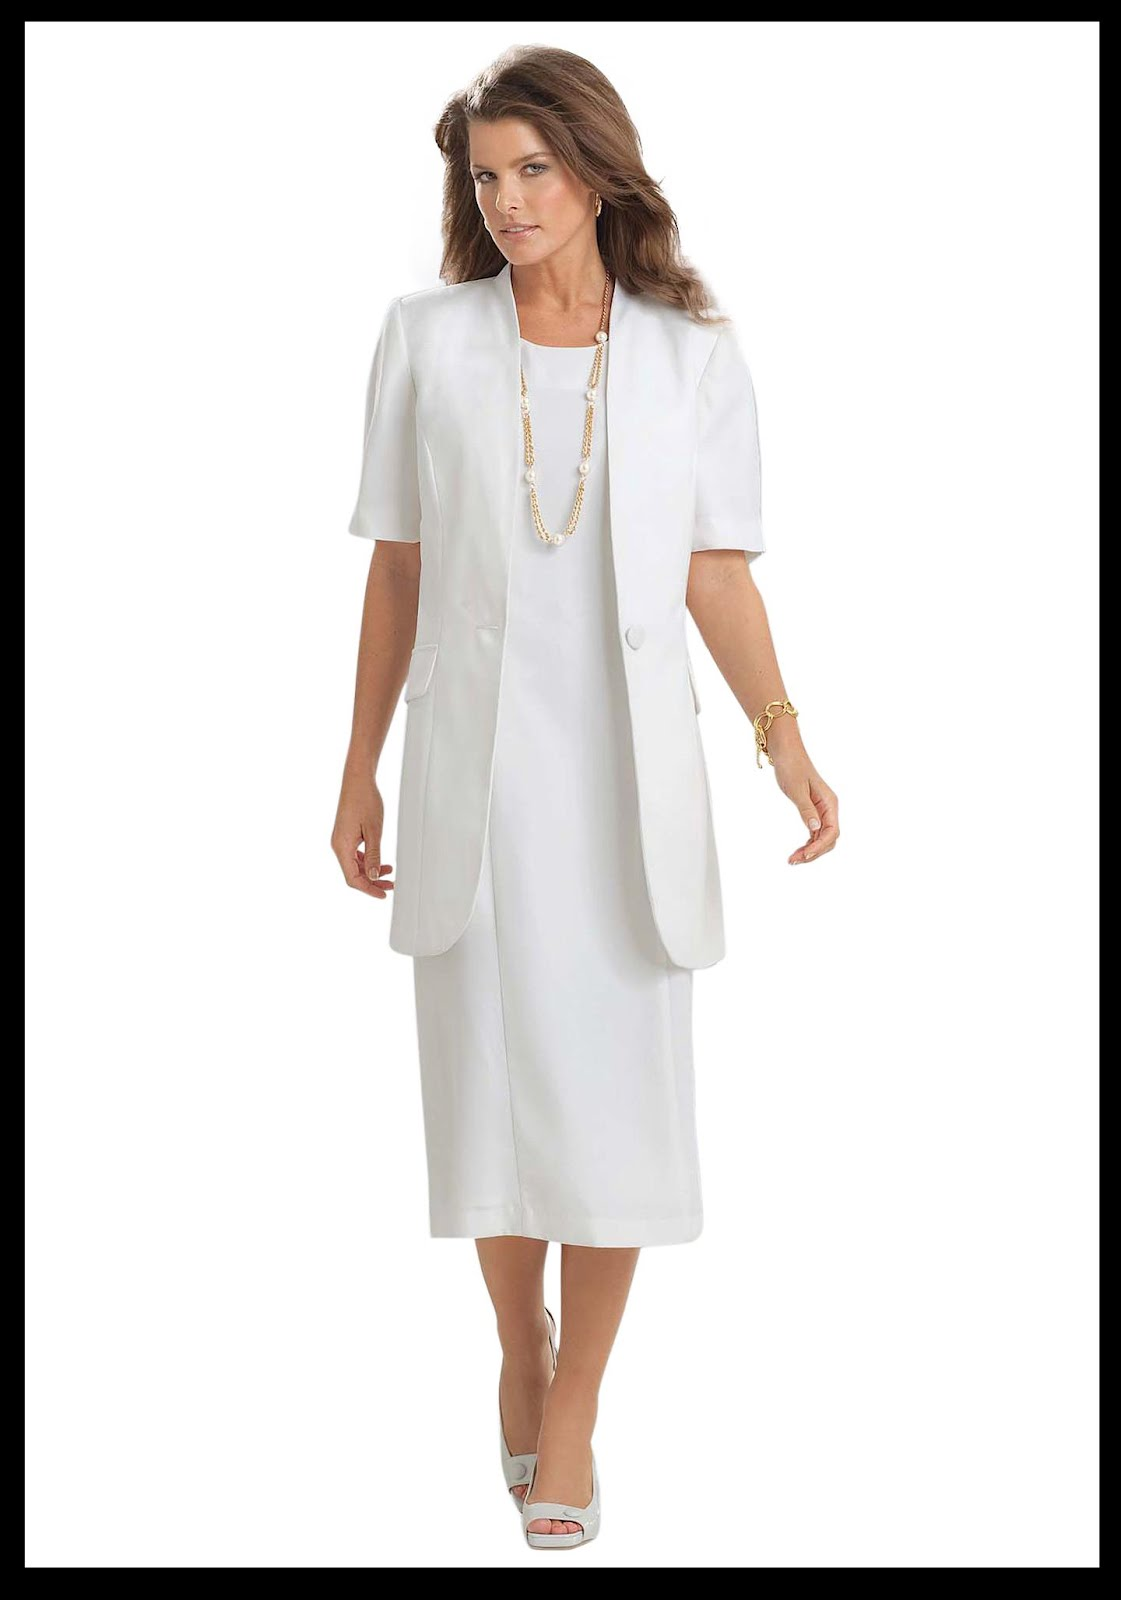 HD wallpapers plus size white dress jacket